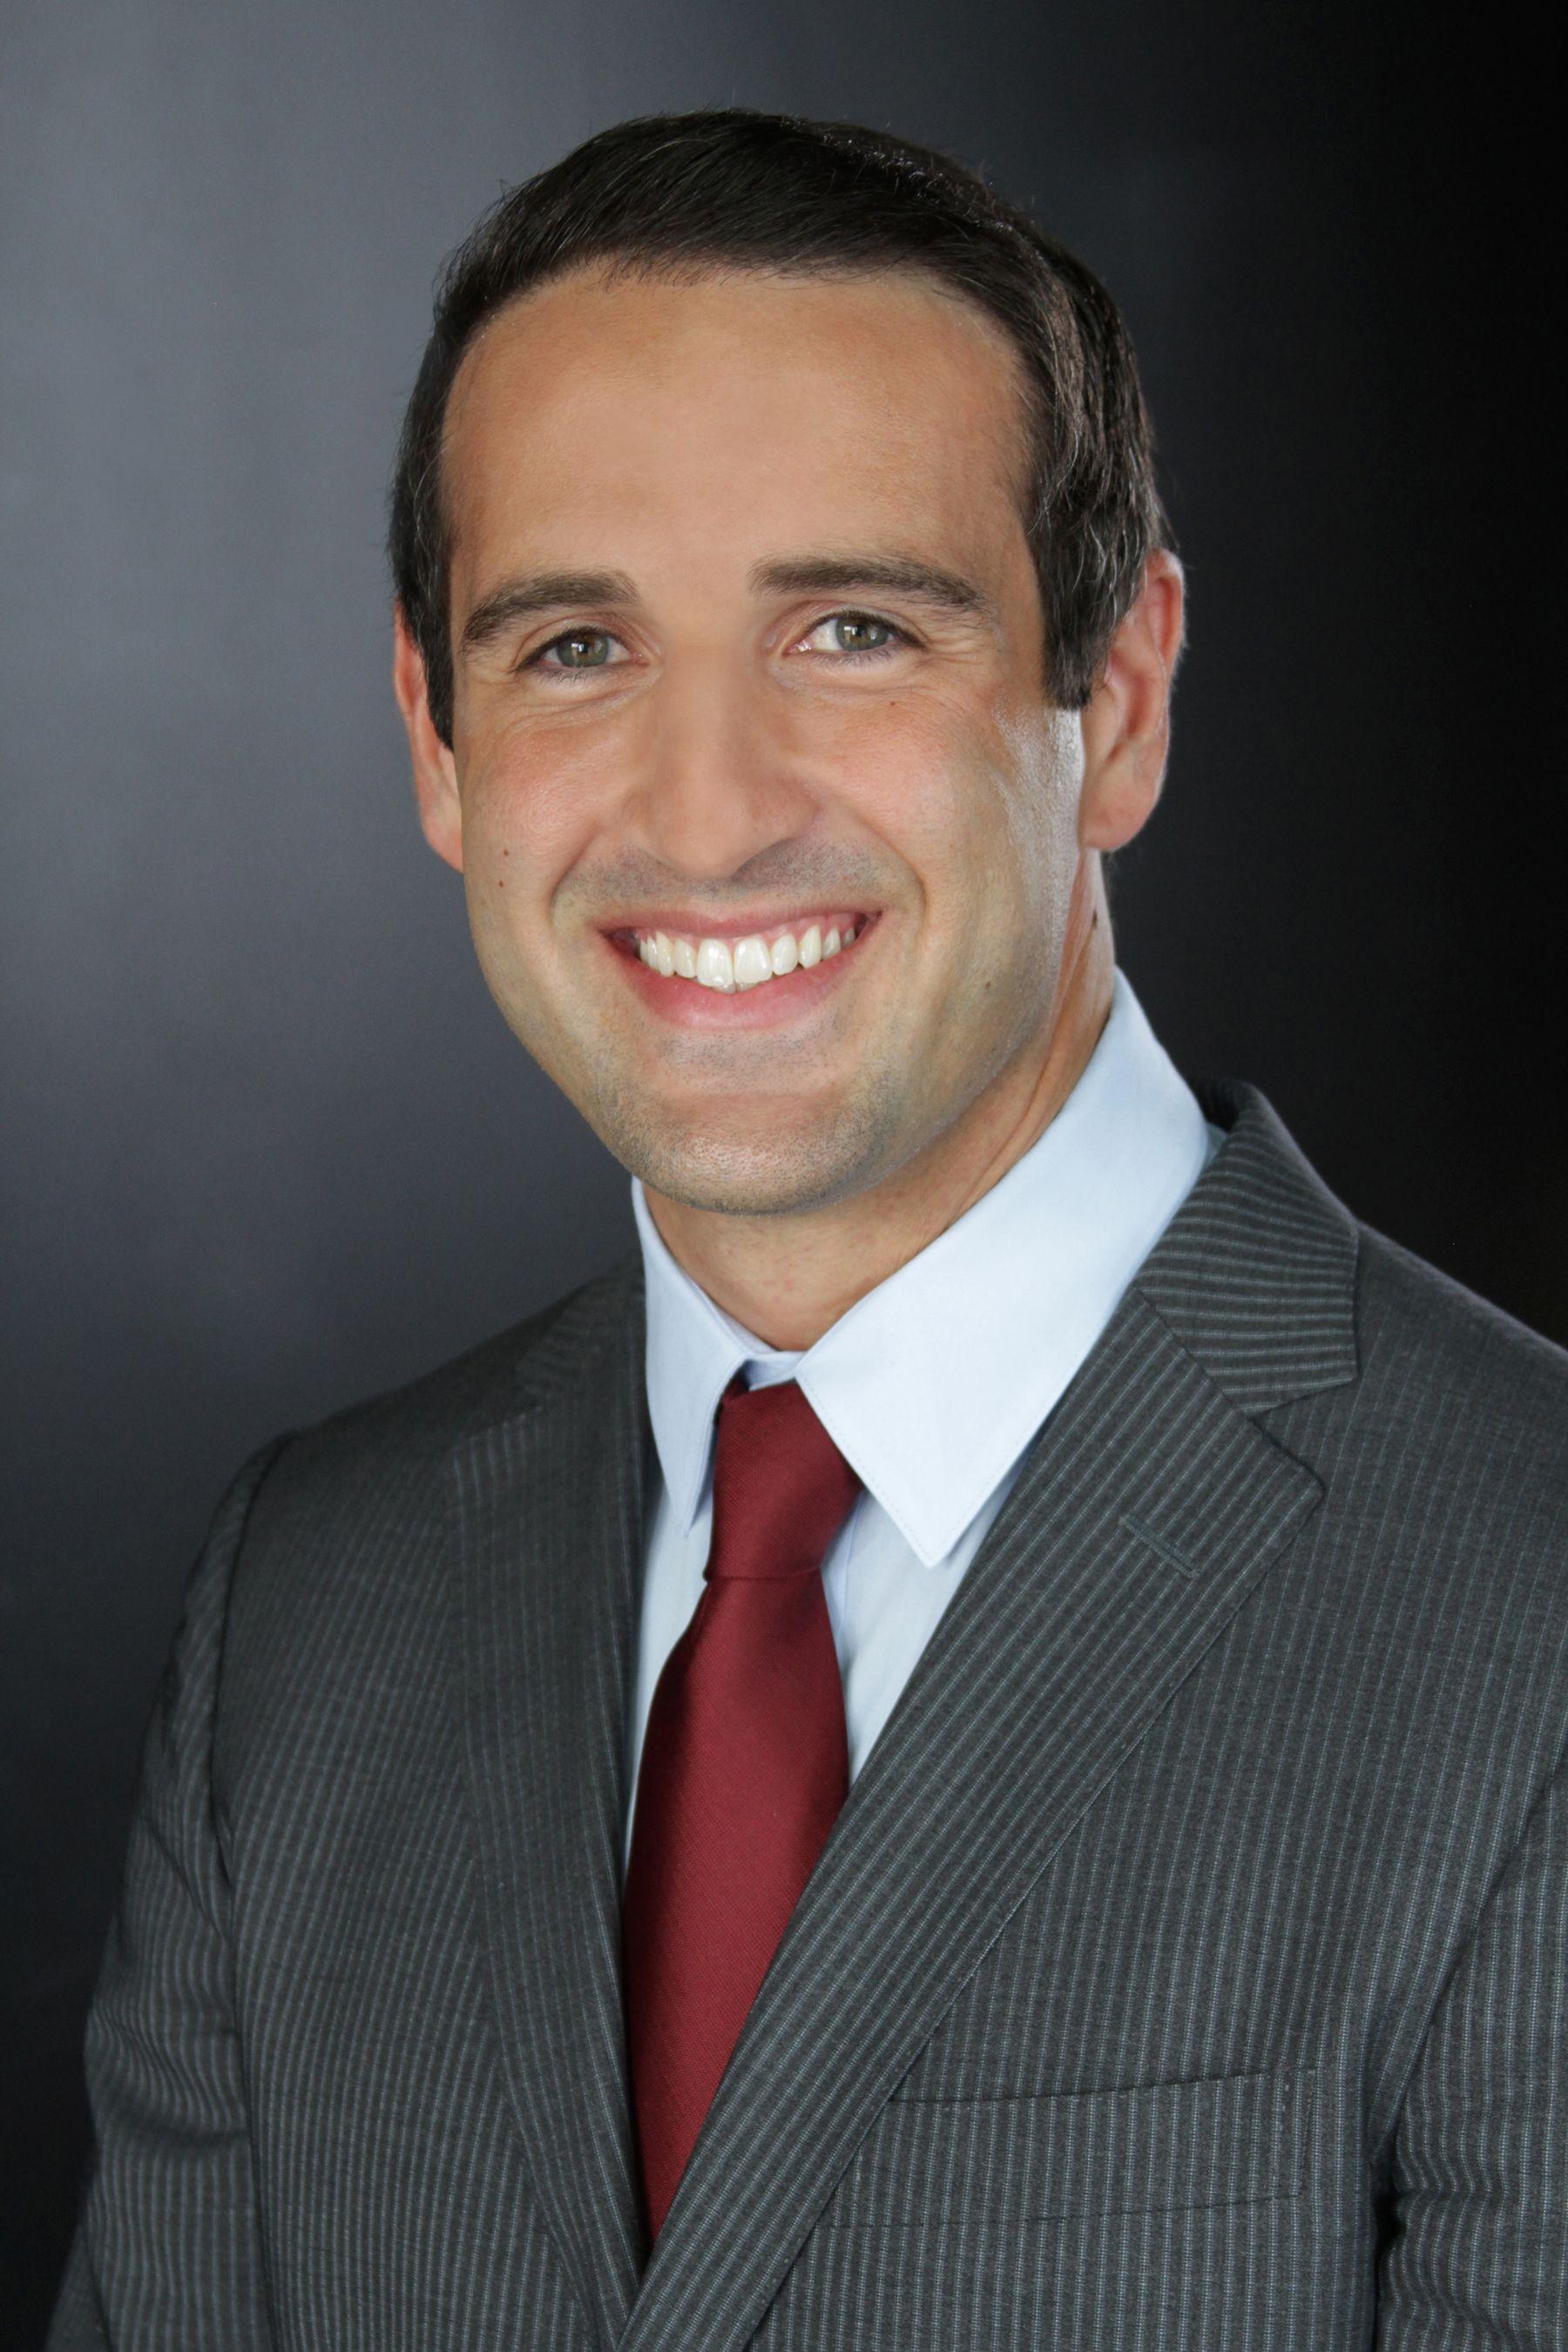 Michael H. Moghimi, MD